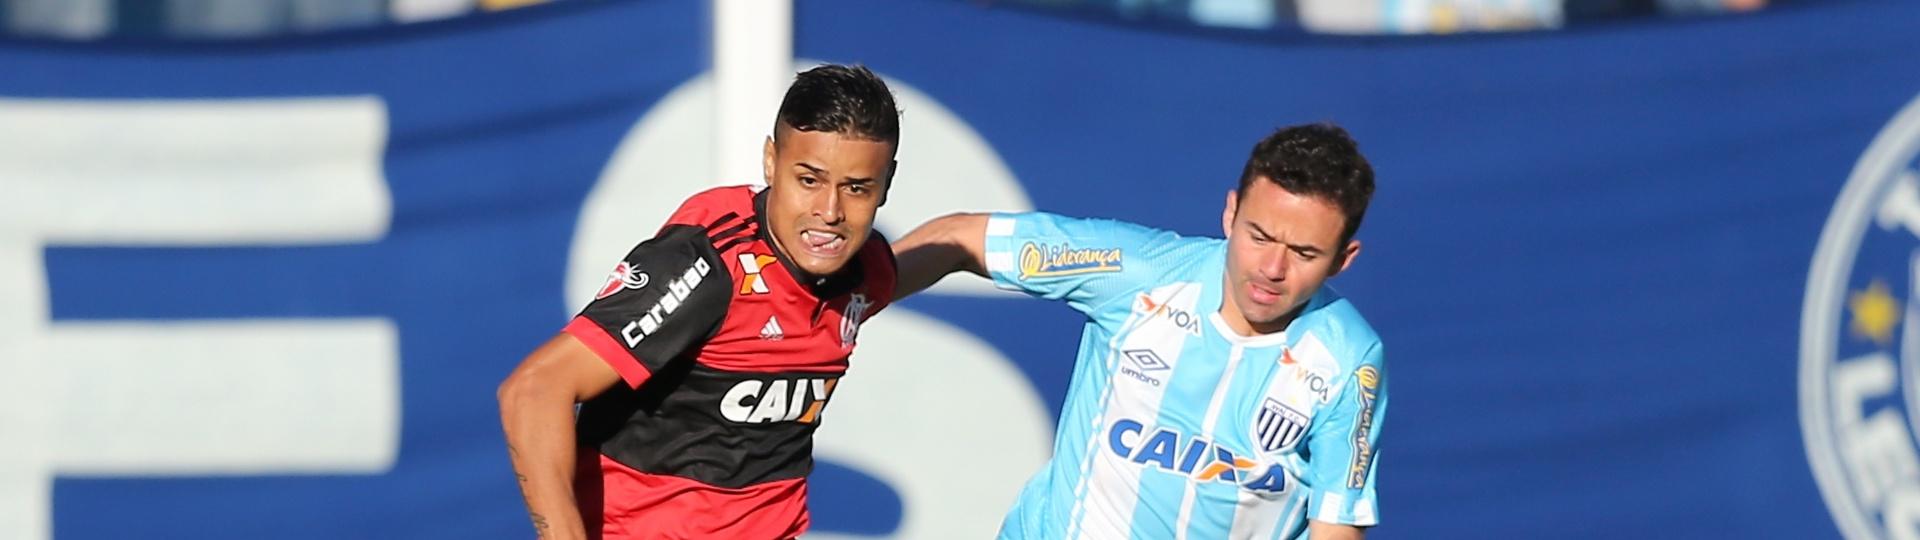 Avaí e Flamengo se enfrentam na Ressacada